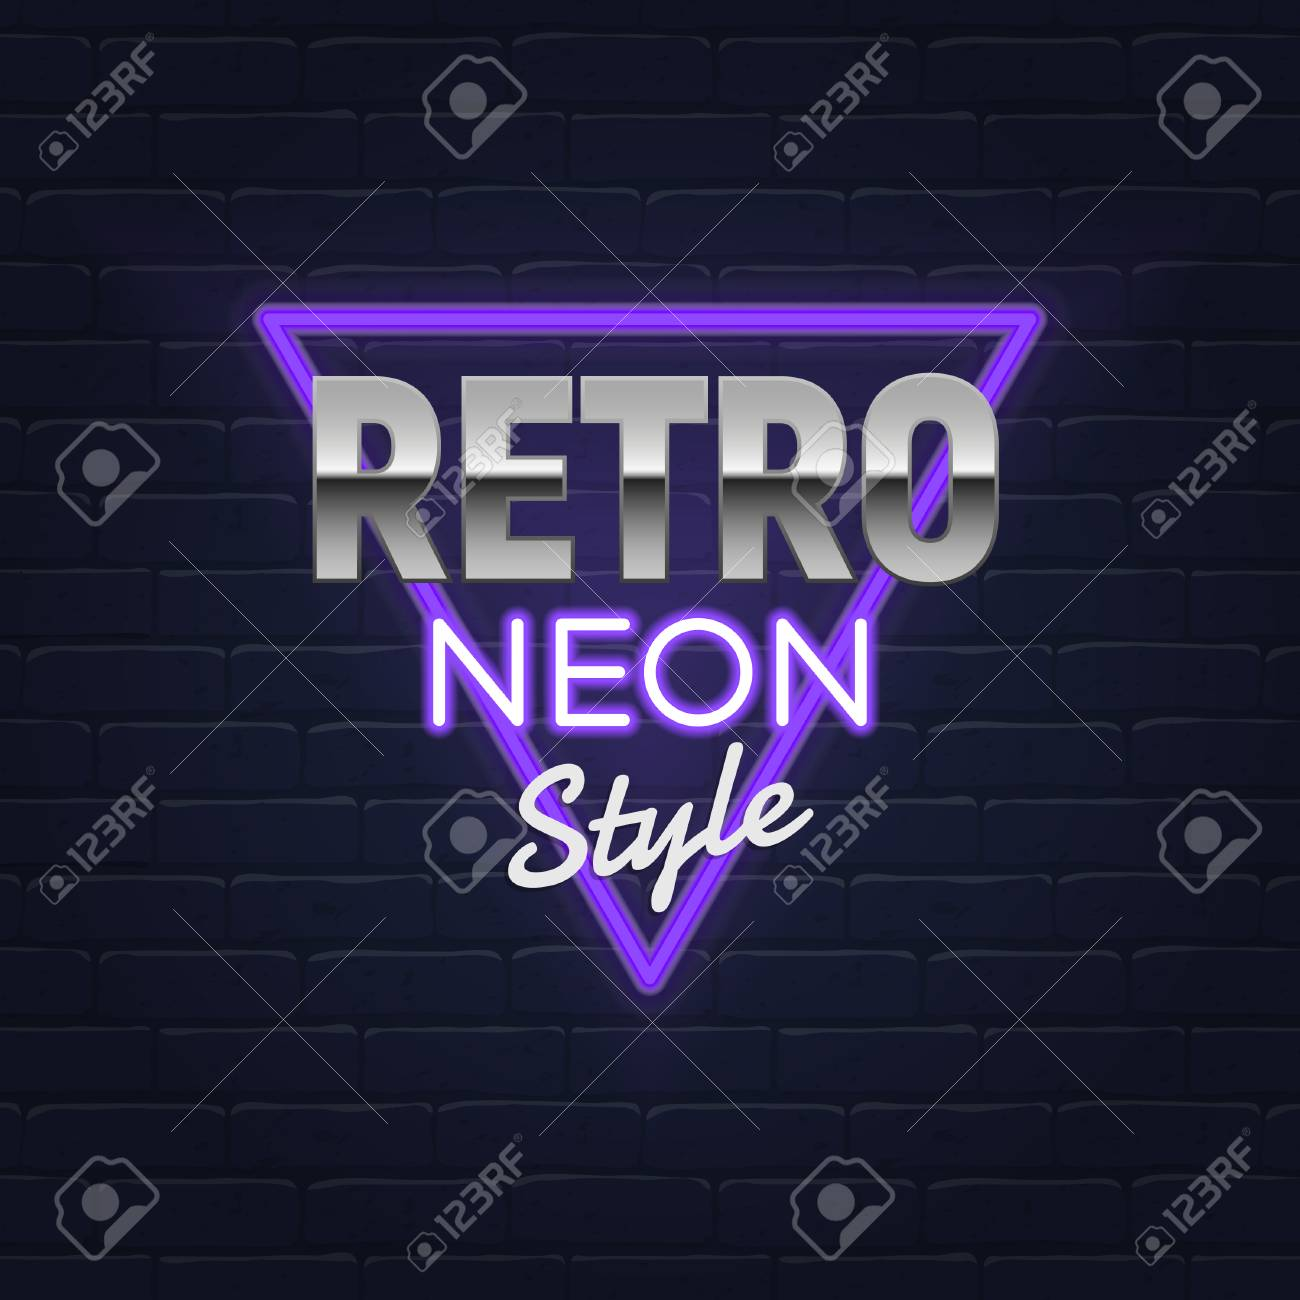 Retro neon banner  Realistic Neon sign  Light banner, frame